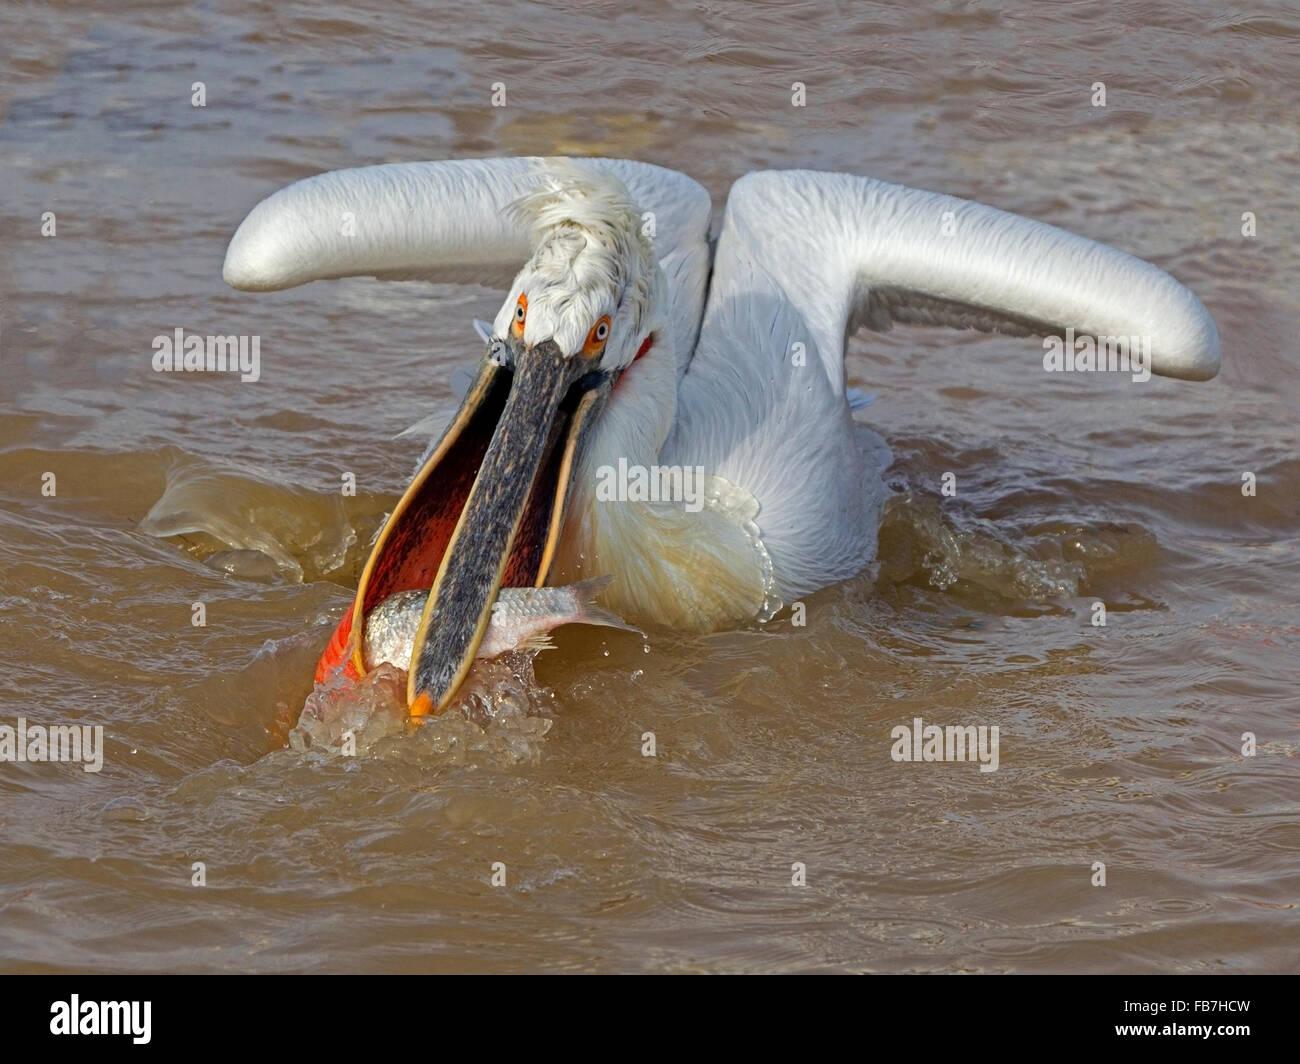 Dalmatian pelican in water with fish - Stock Image